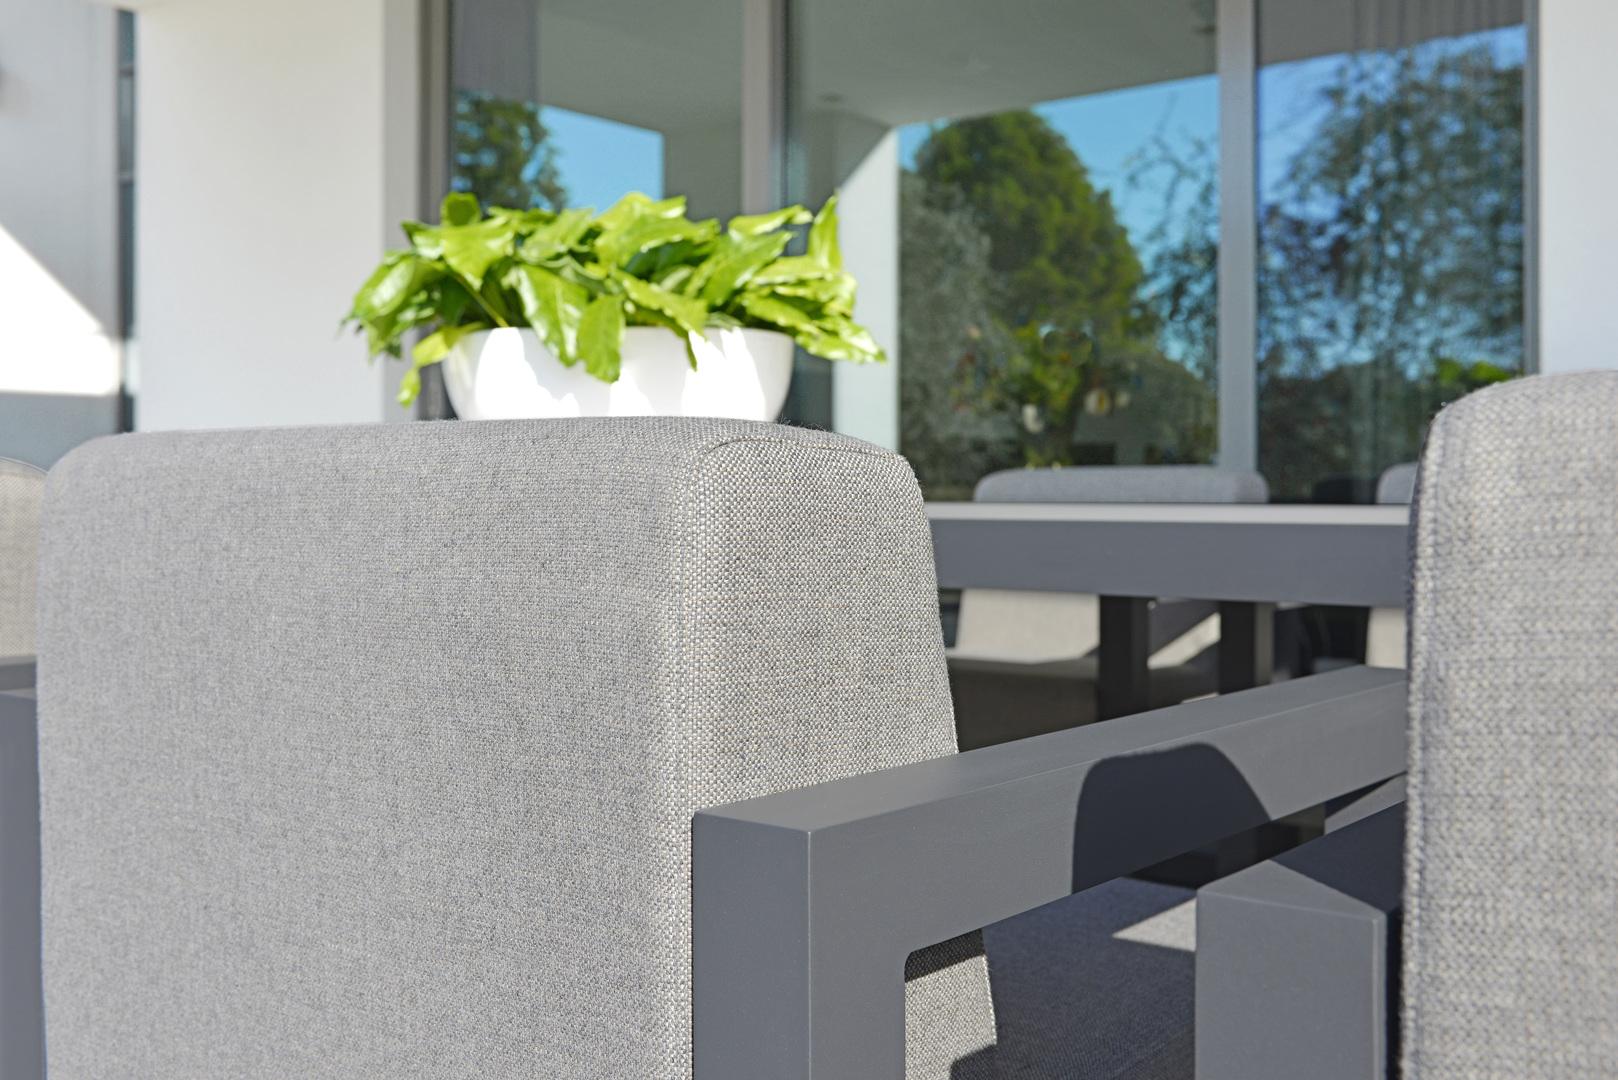 2017 Borek alu outdoor fabric Bergen chair detail-1.jpg